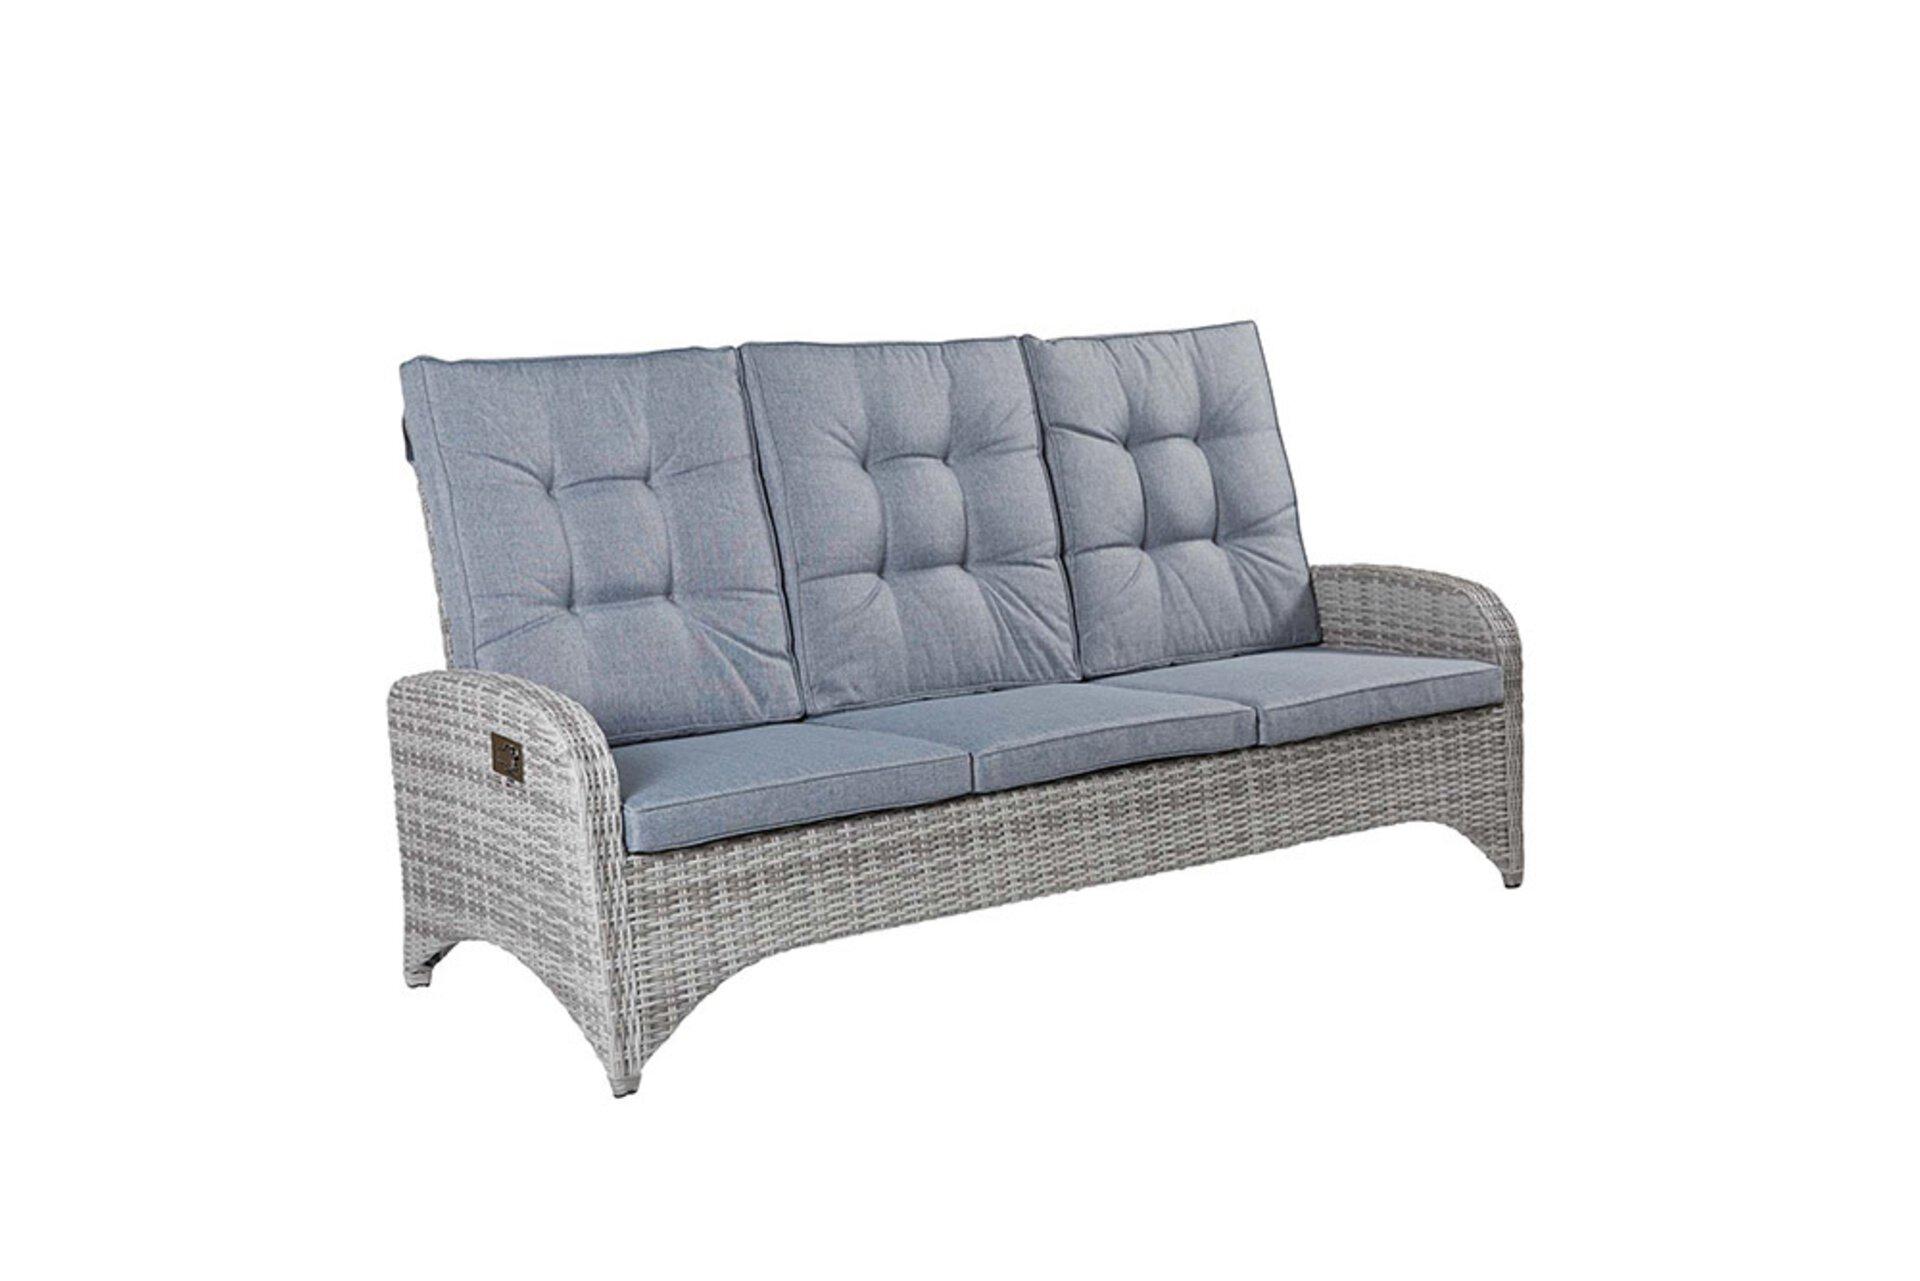 Sofa 3-Sitzer NIZZA LC Wholesaler Textil weiß